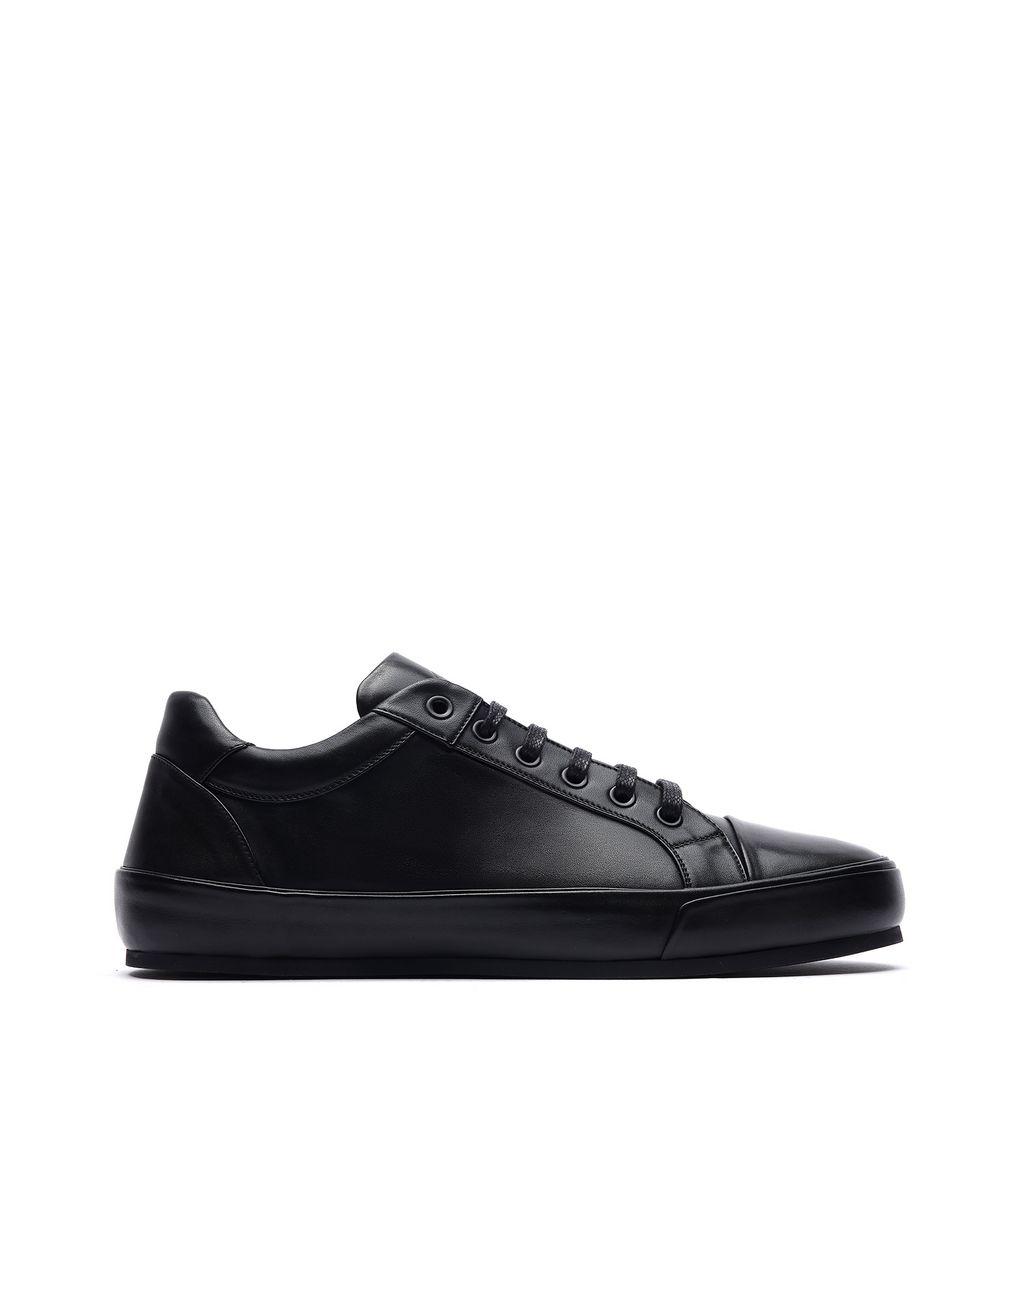 BRIONI Black Sneaker Sneakers Man f